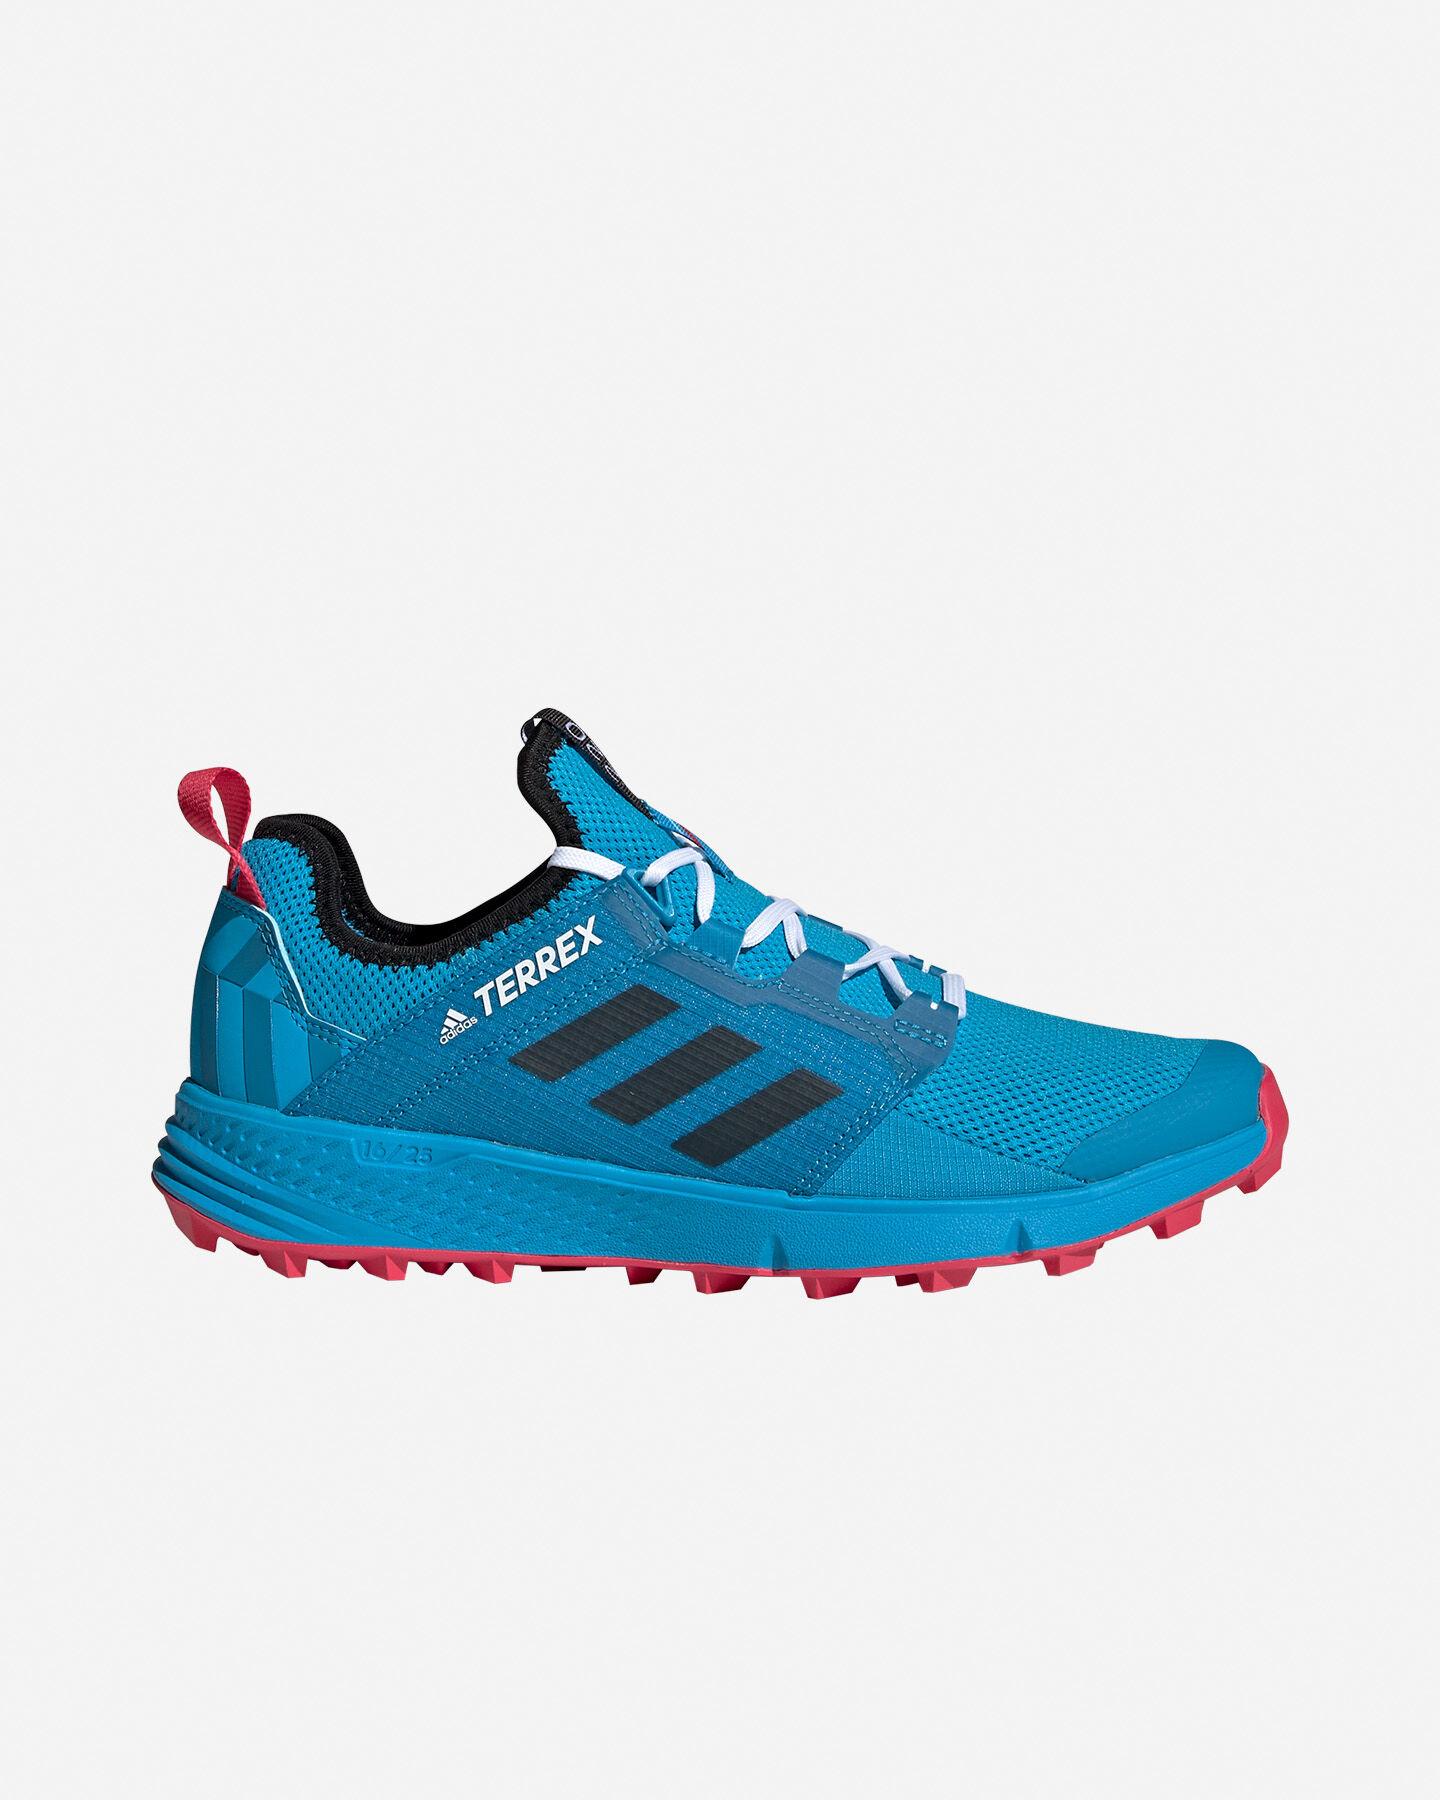 adidas terrex stivali hiking scarpe uomo